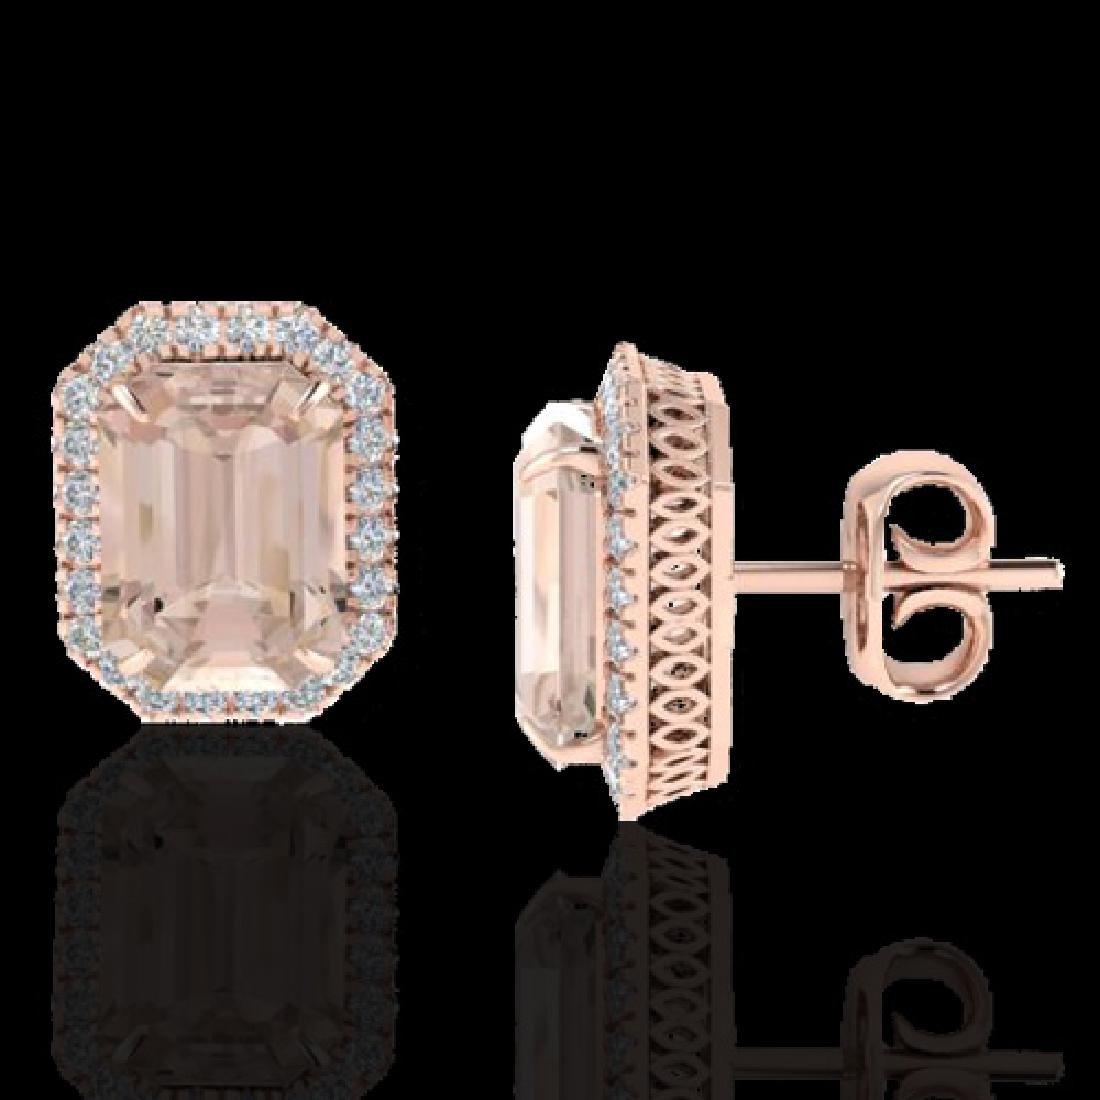 8.40 CTW Morganite & Micro Pave VS/SI Diamond Halo - 2